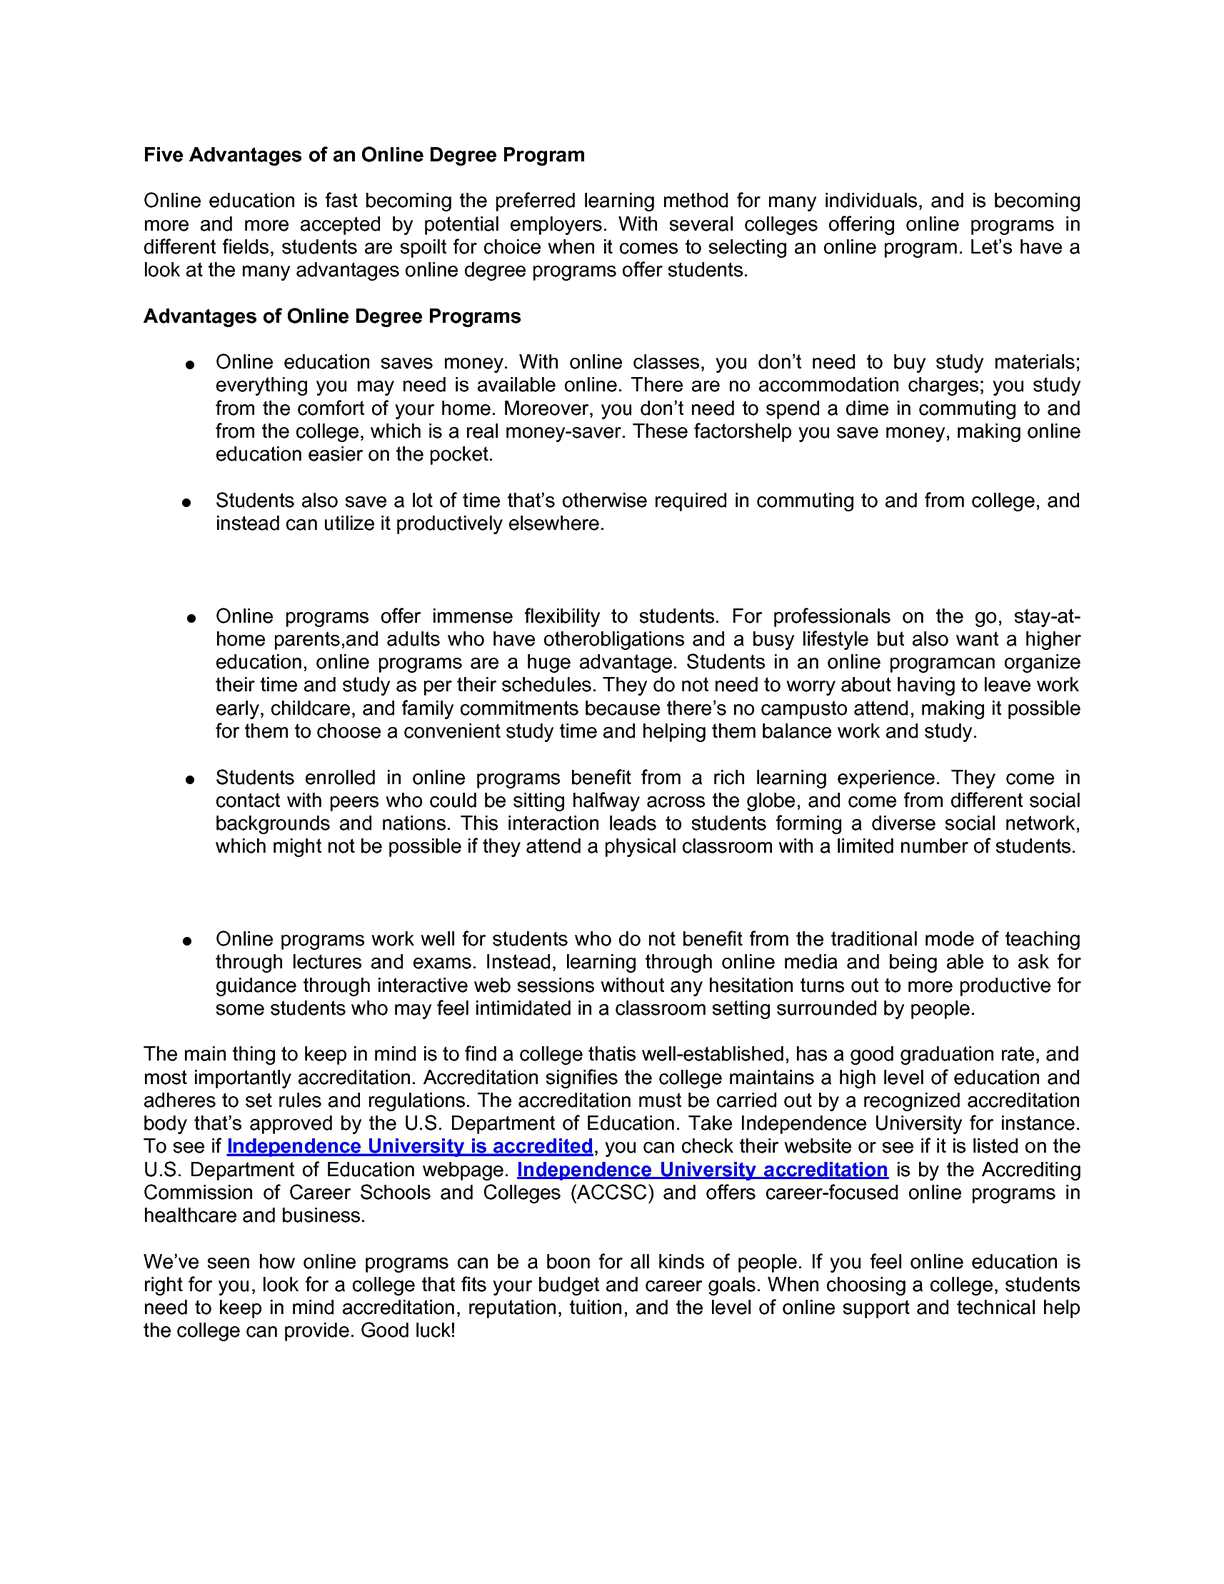 Calaméo - Five Advantages of an Online Degree Program